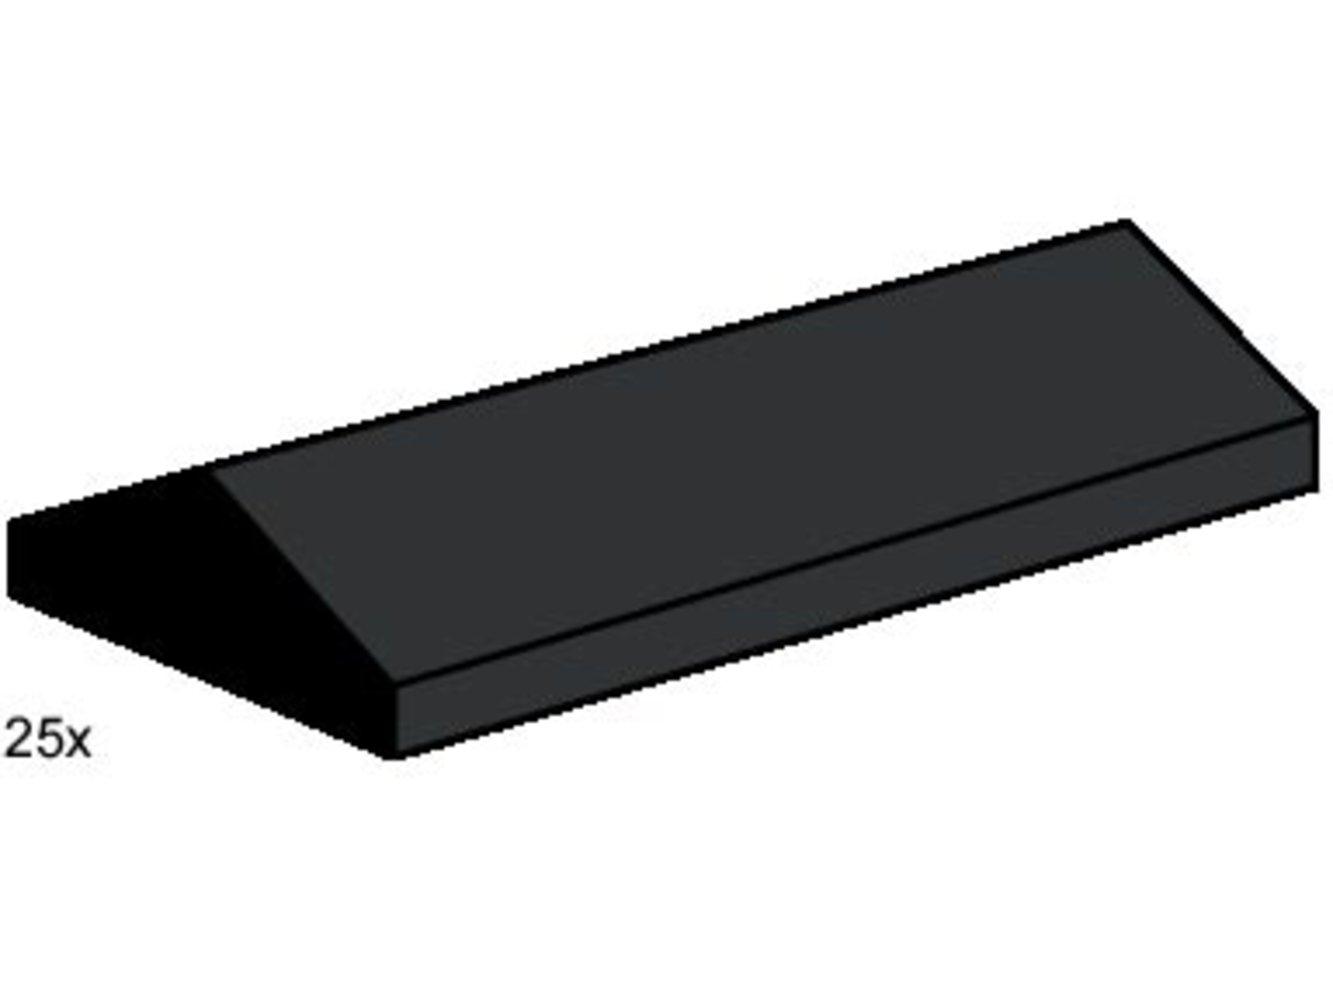 2 x 4 Ridge Roof Tile Low Sloped Black